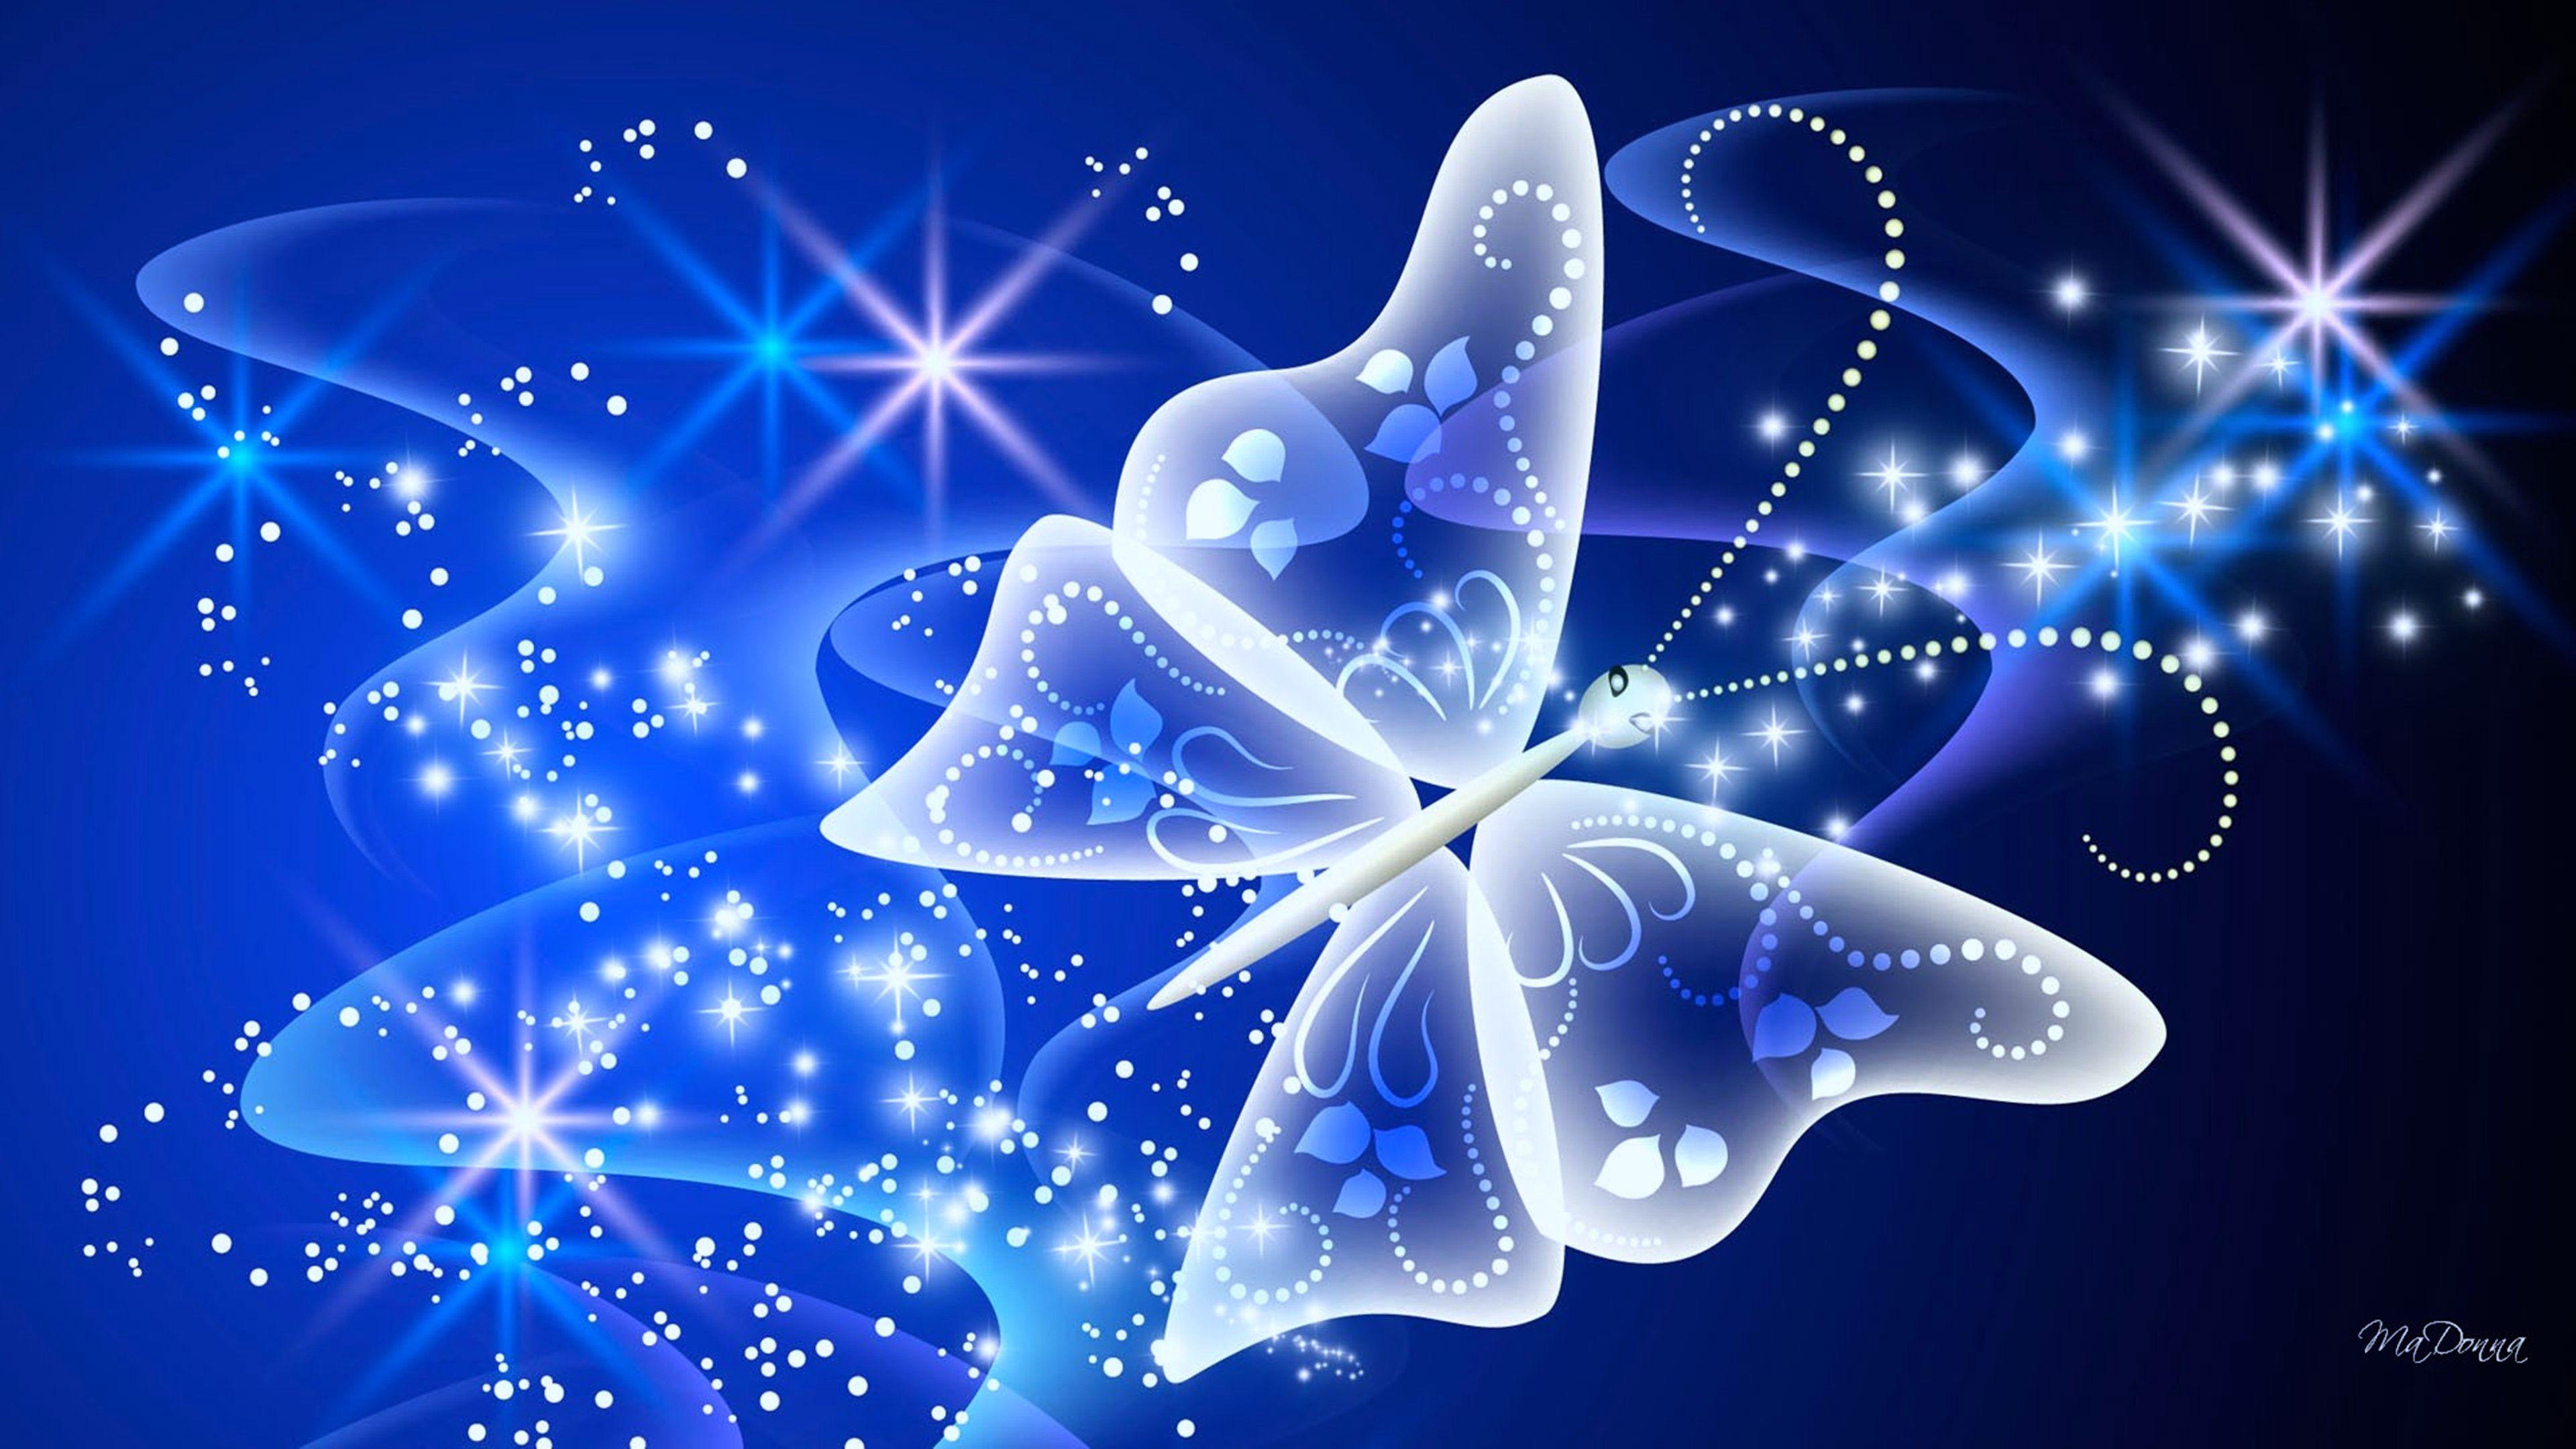 Magical Butterfly wallpapers stars beauty wallpaper